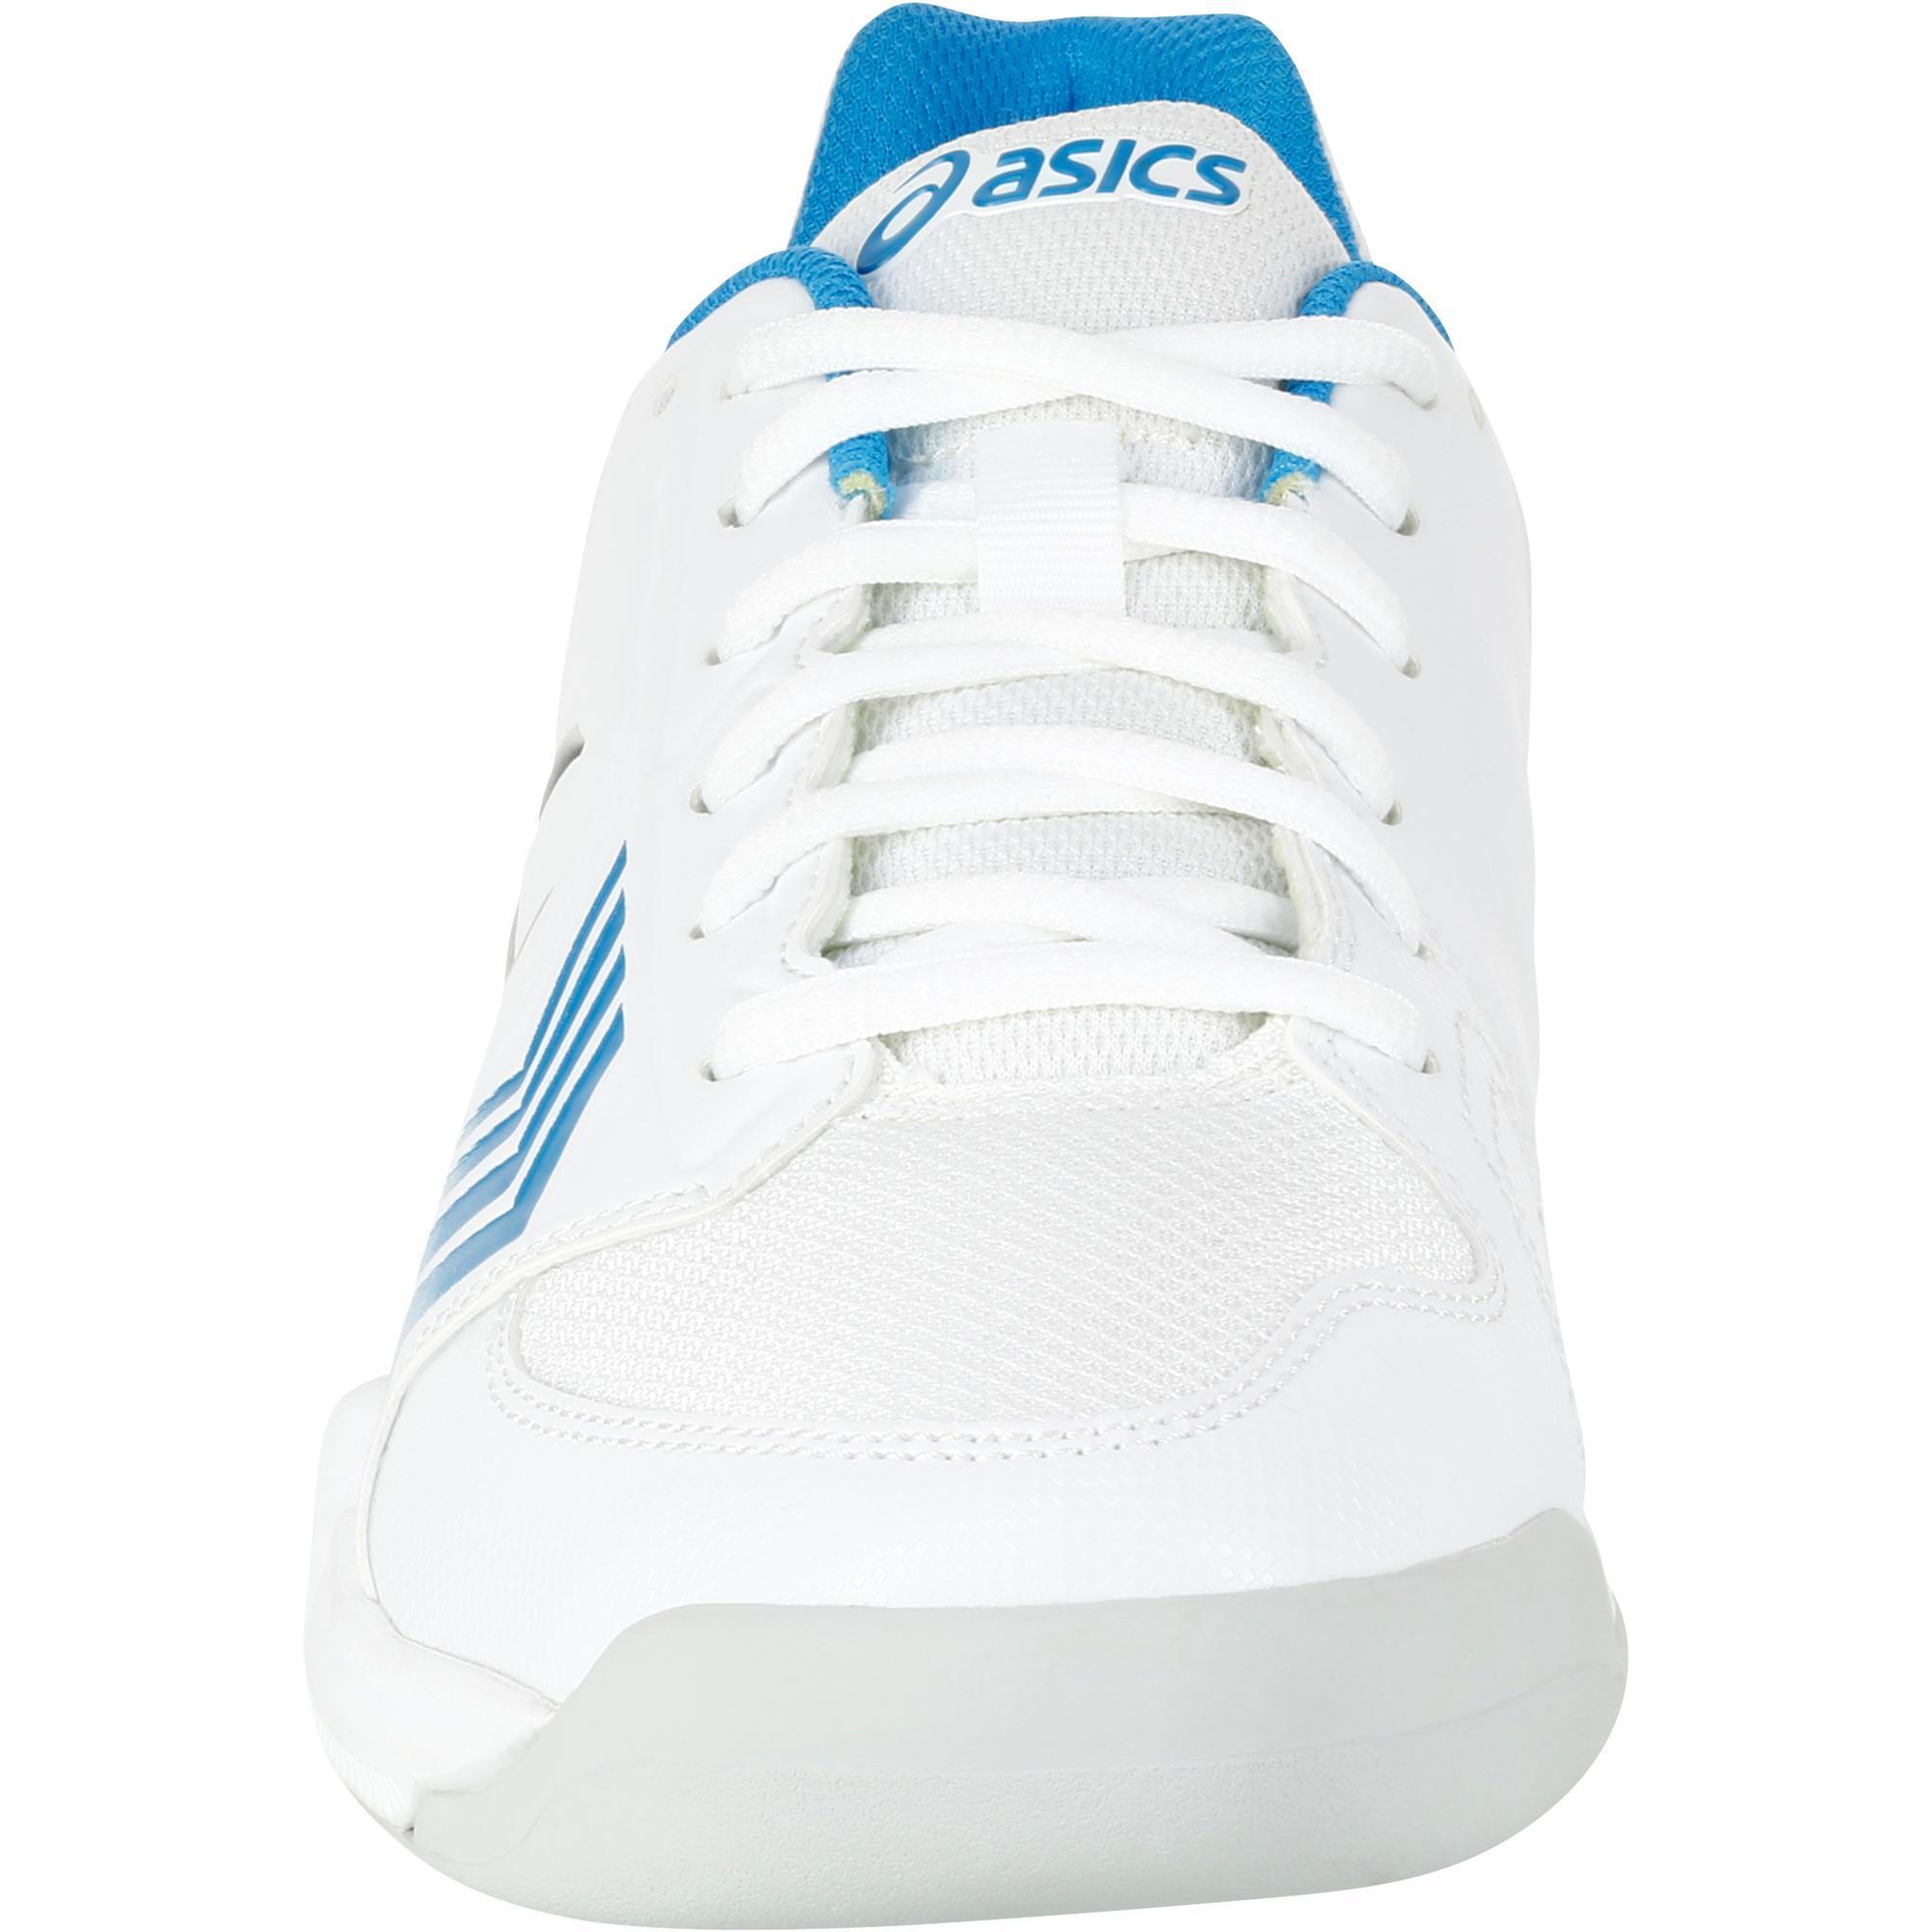 51294ff319 Asics Indoor Tennisschuhe Gel Dedicate 5 Gr 44 Tennis Schuhe Herren Tennis